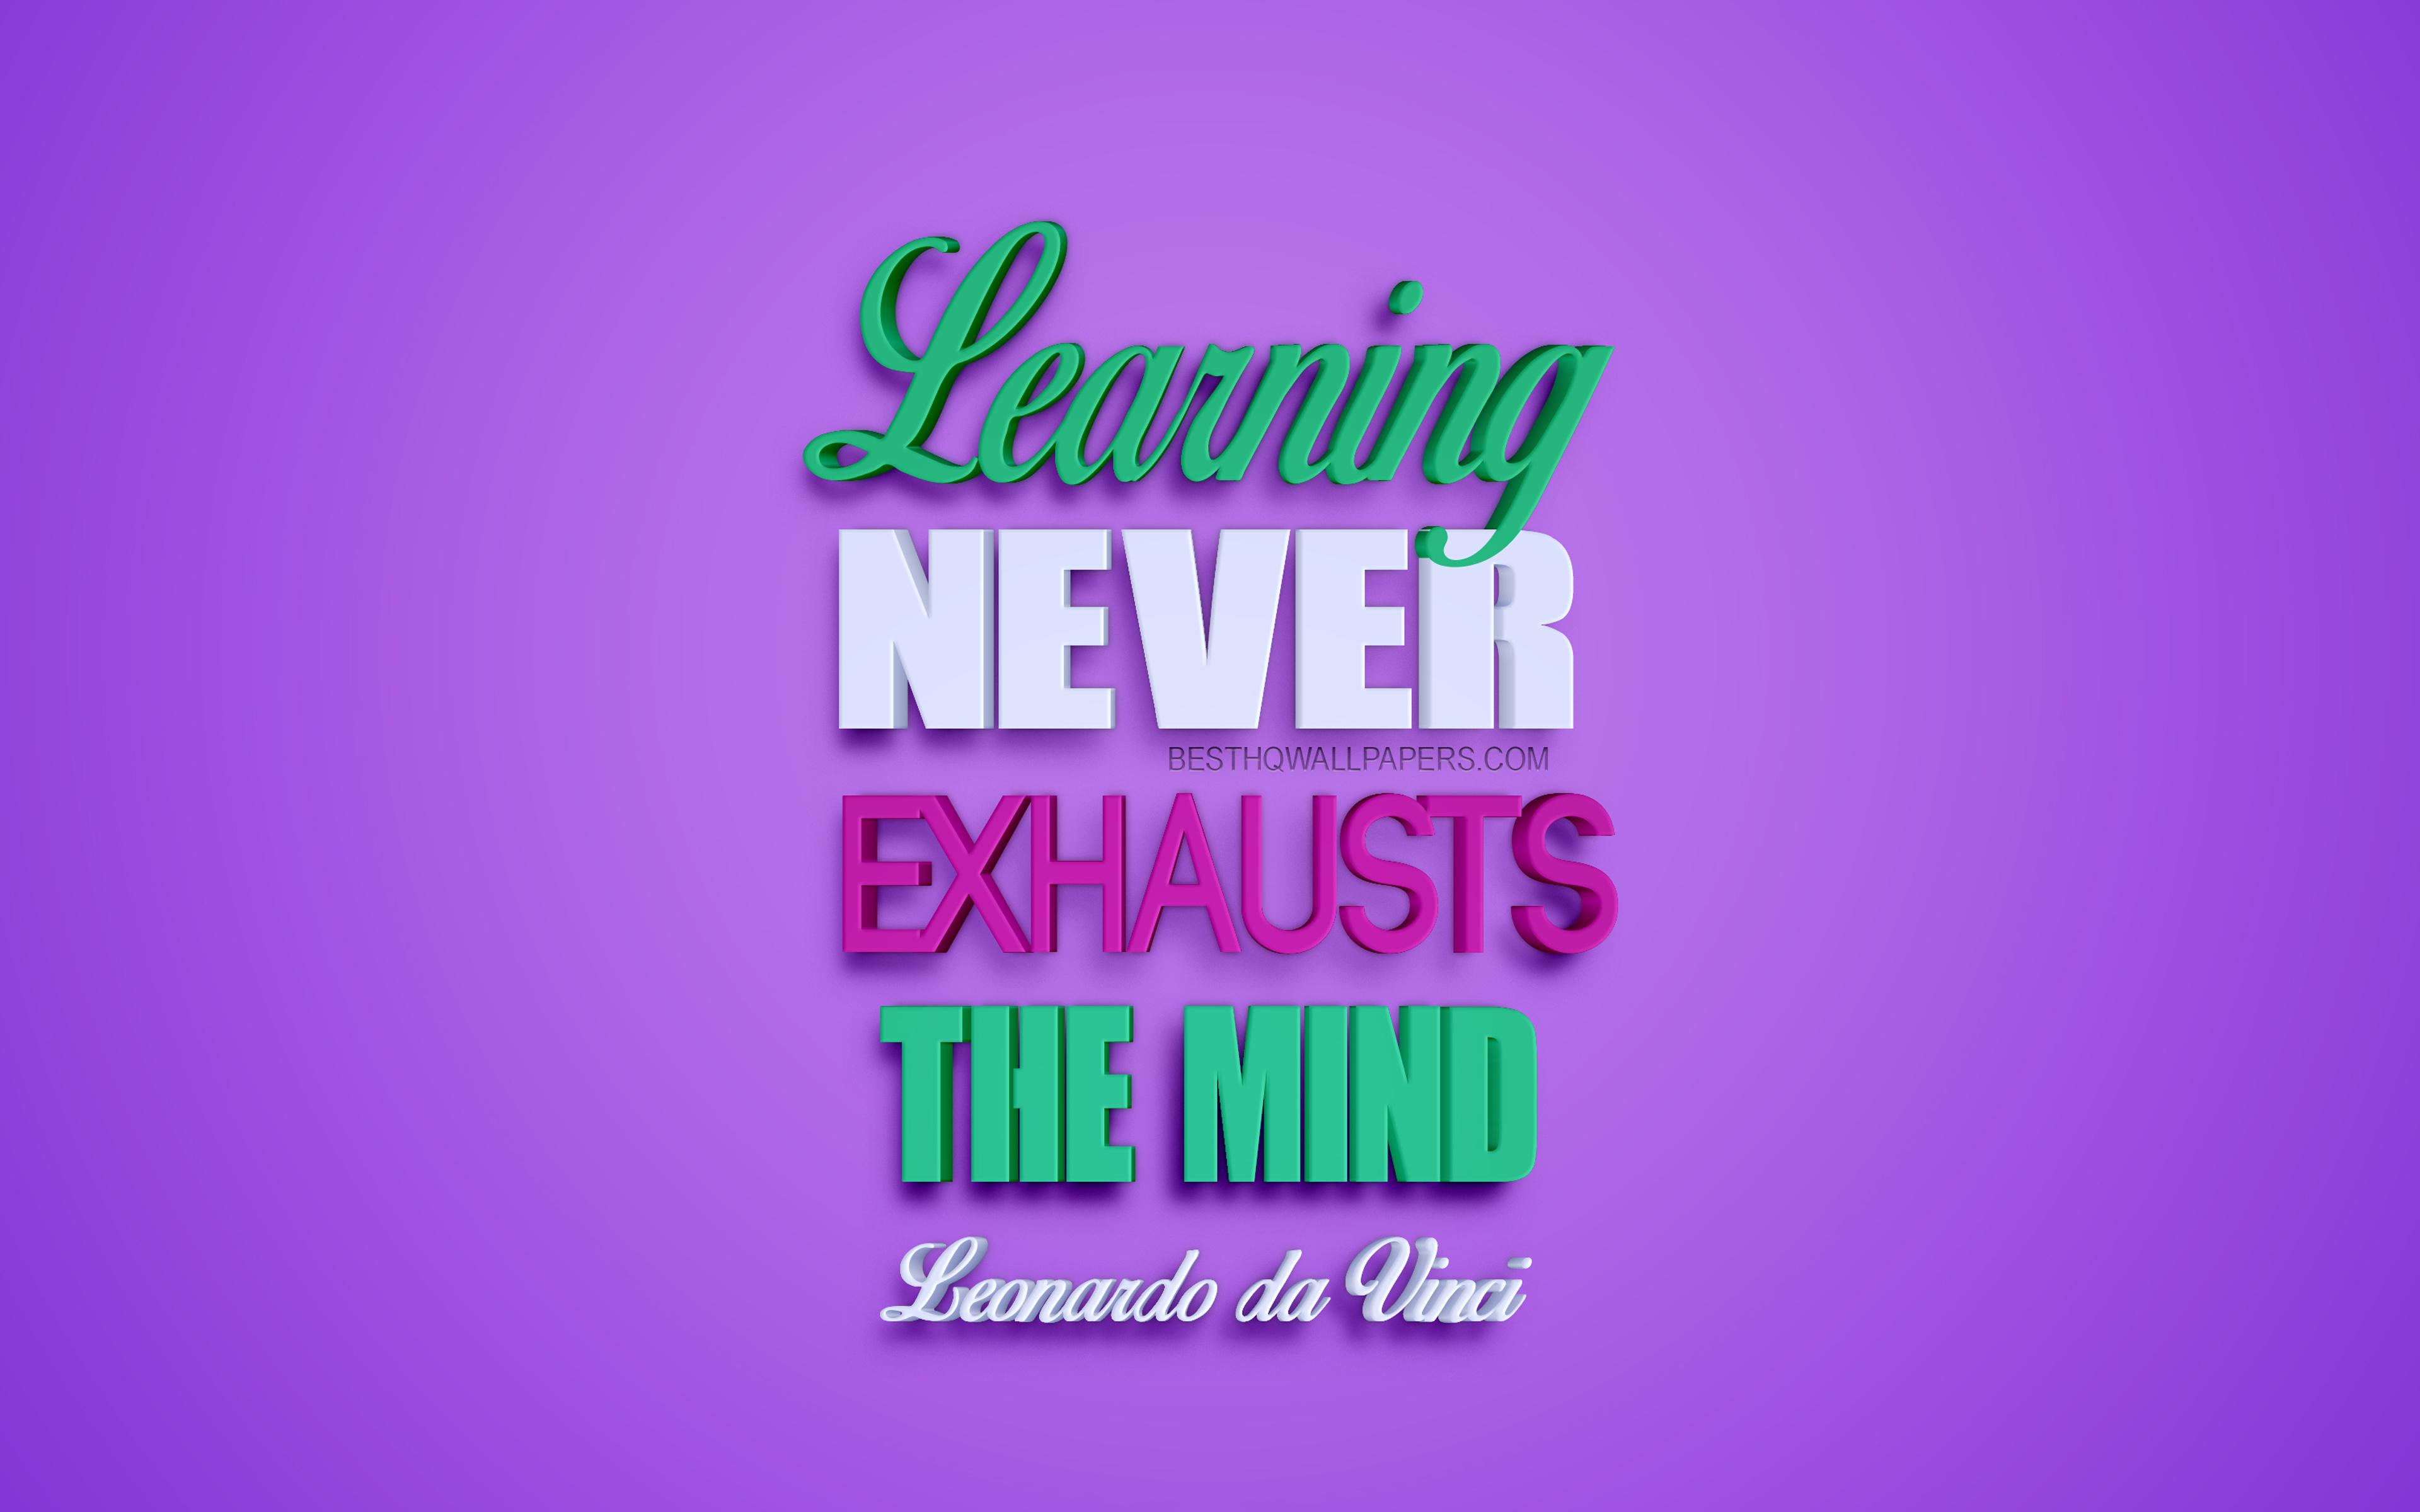 Learning Never Exhausts The Mind, Leonardo Da Vinci - Graphic Design - HD Wallpaper